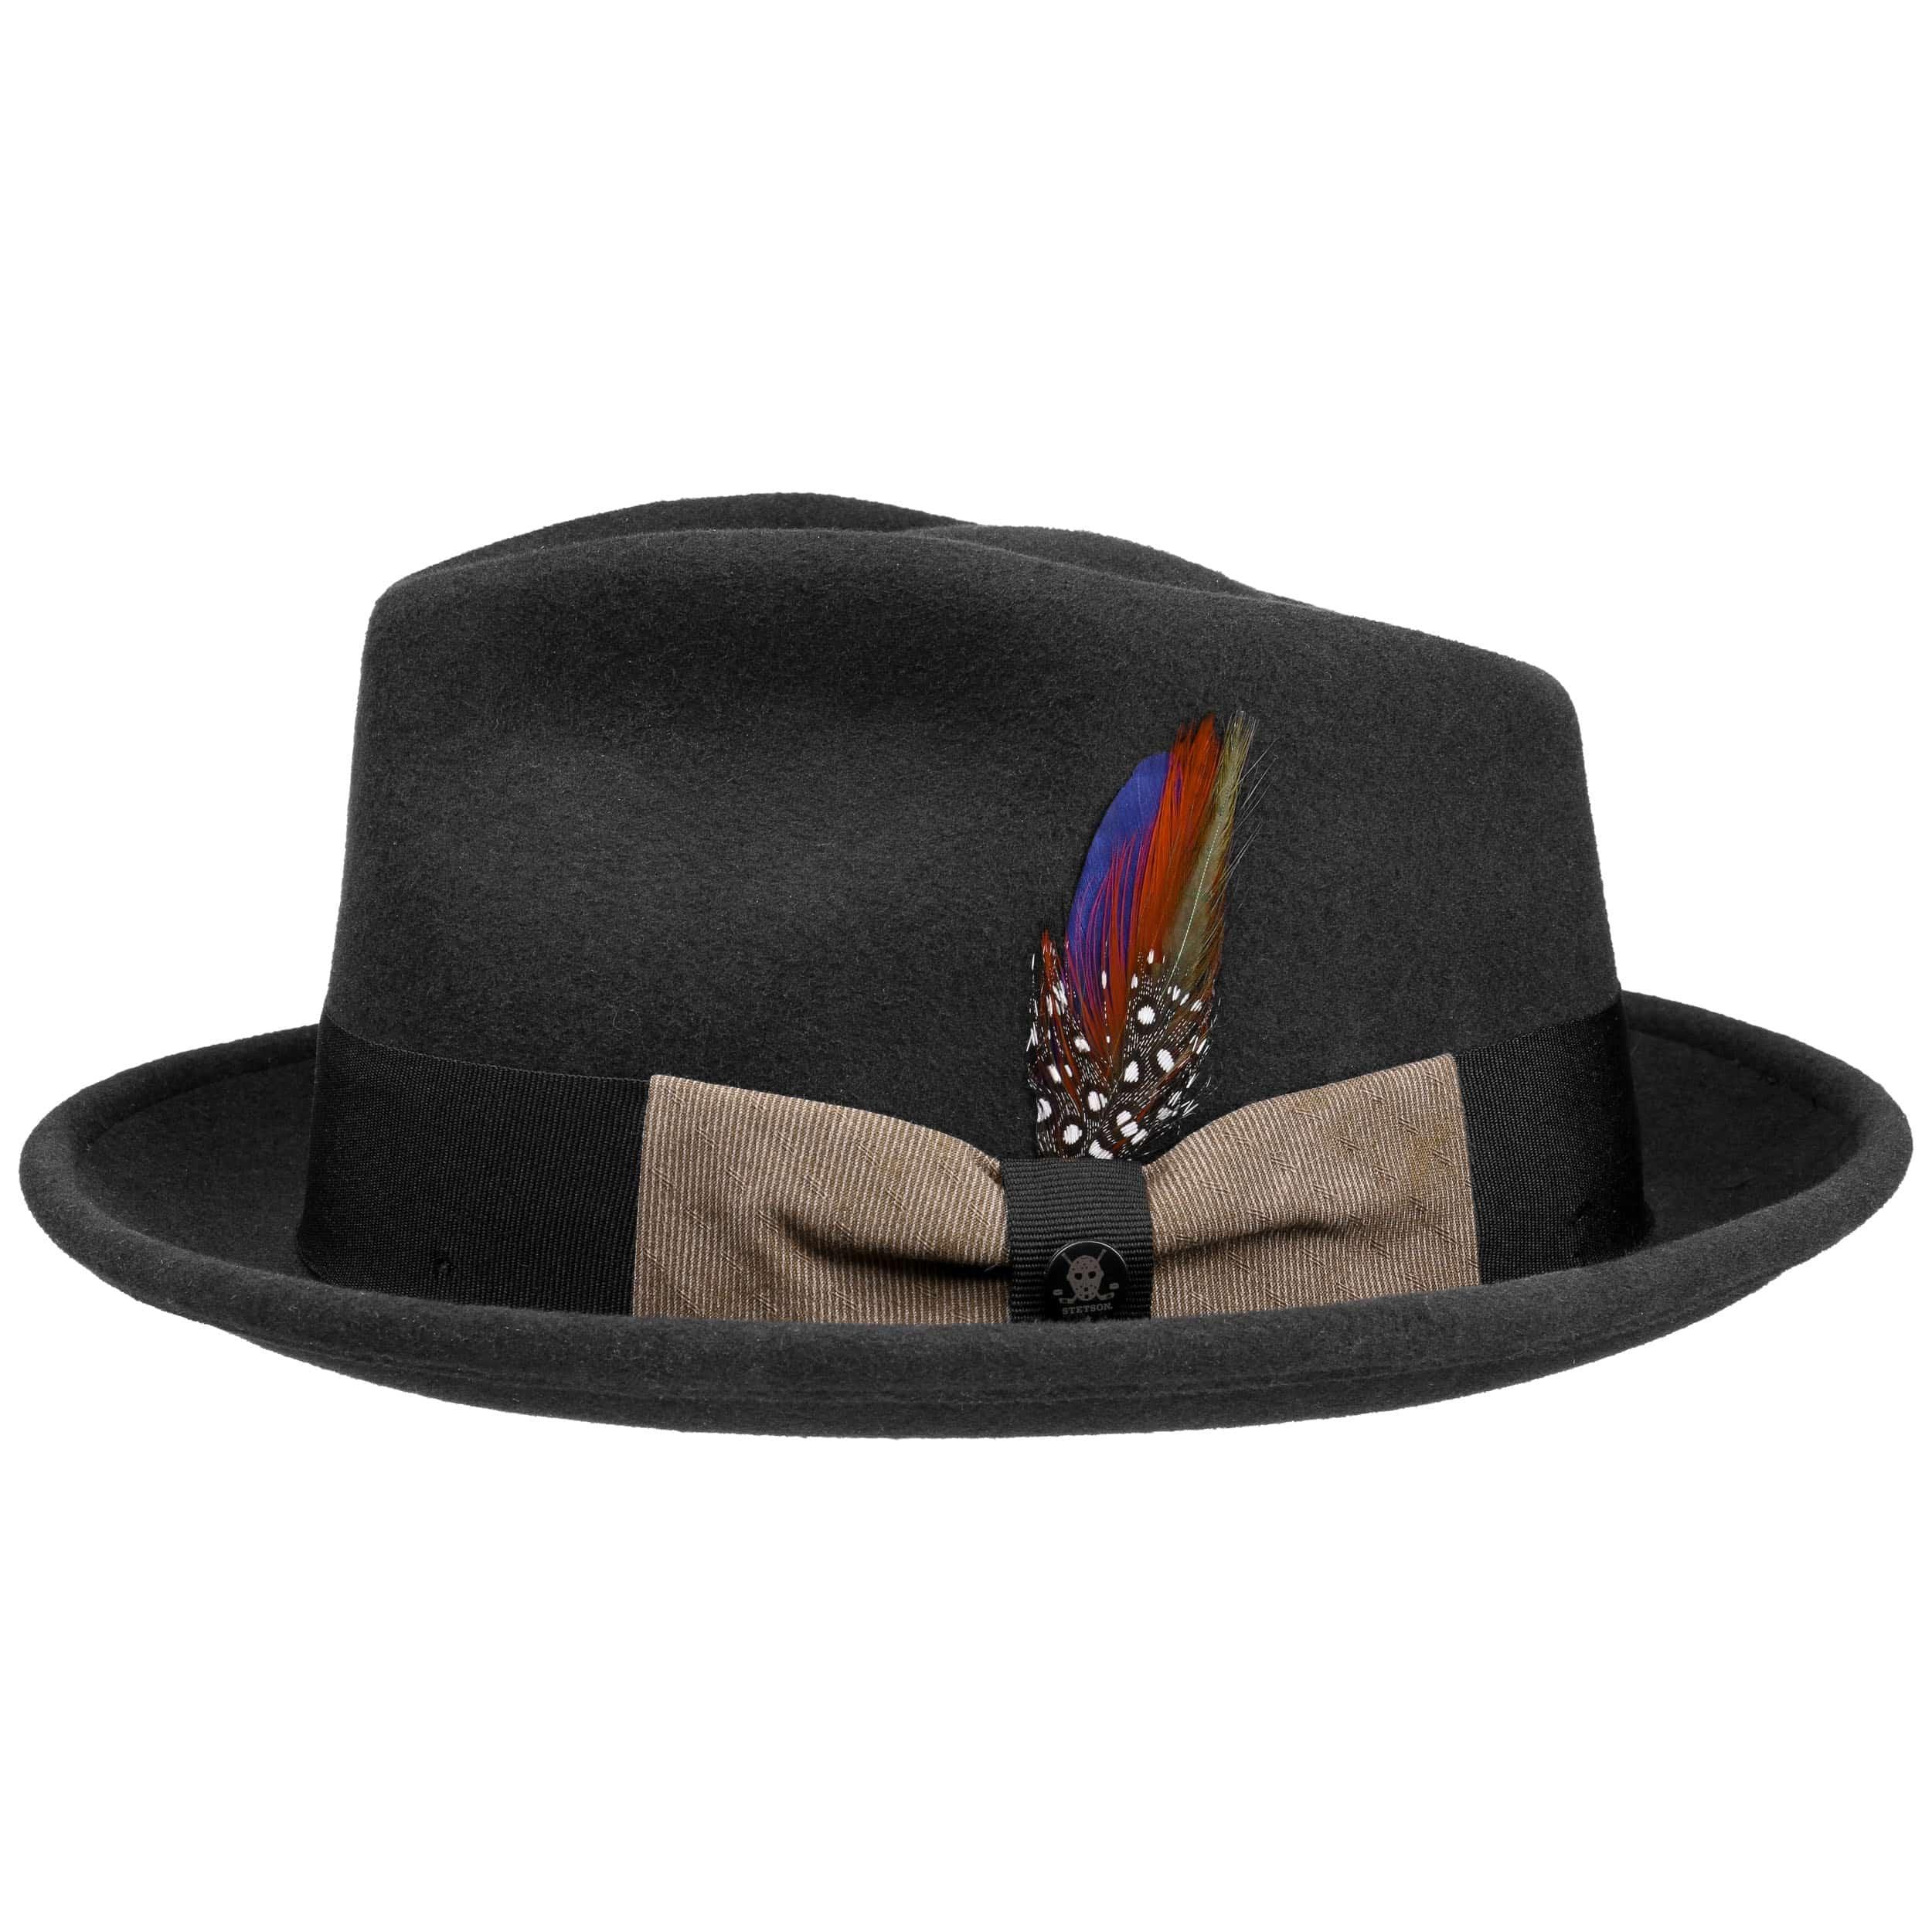 6a44263719f3d6 ... Virgi Wool Felt Trilby Hat by Stetson - black 5 ...